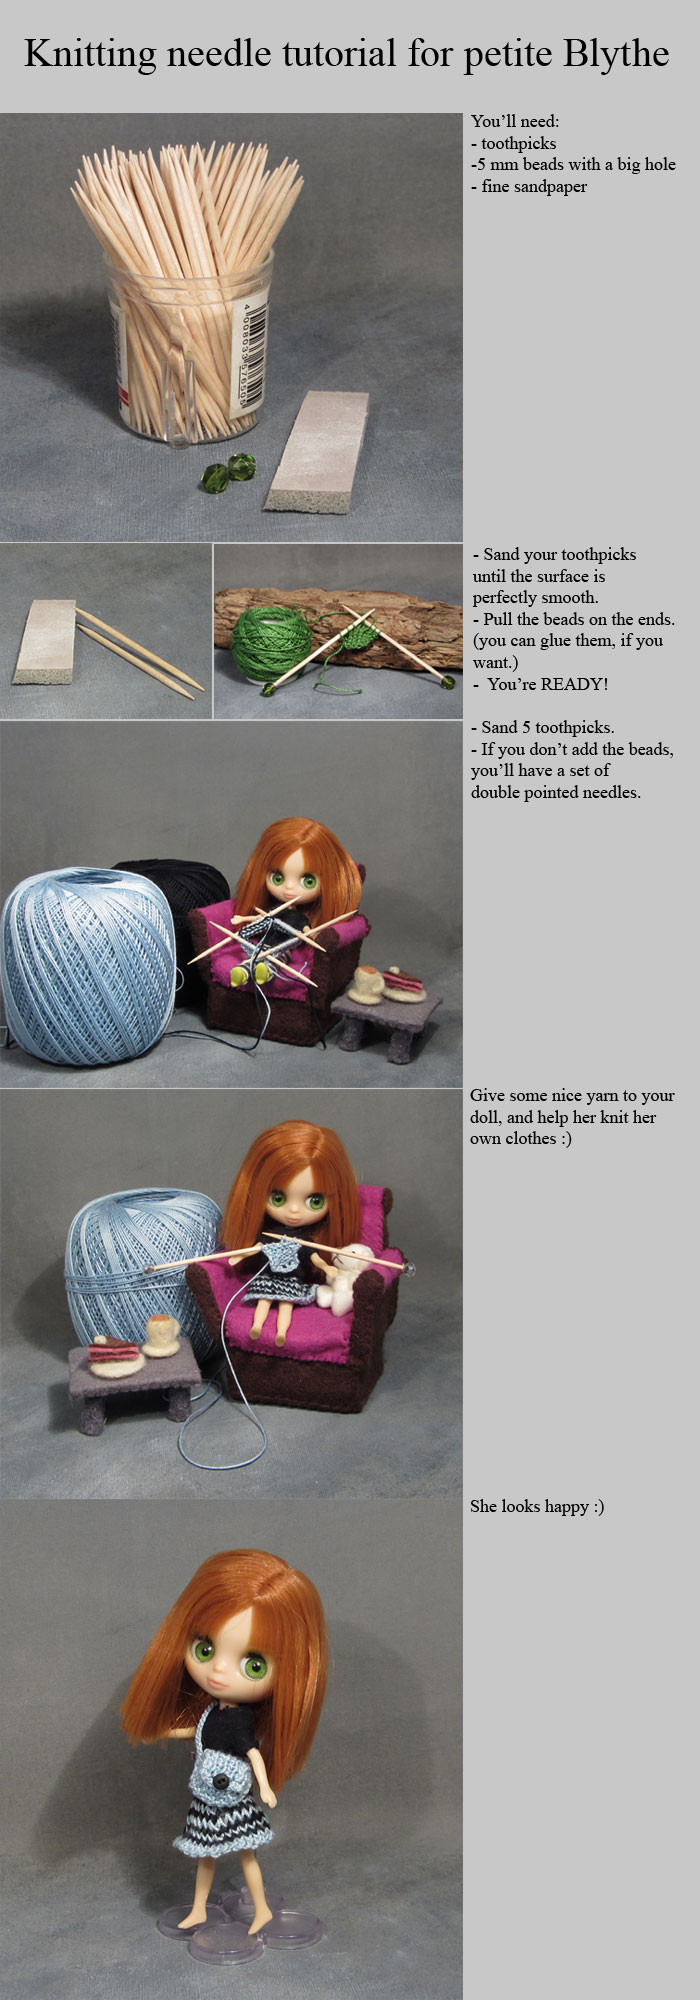 Easy knitting needle tutorial for petite blythe by bodaszilvia